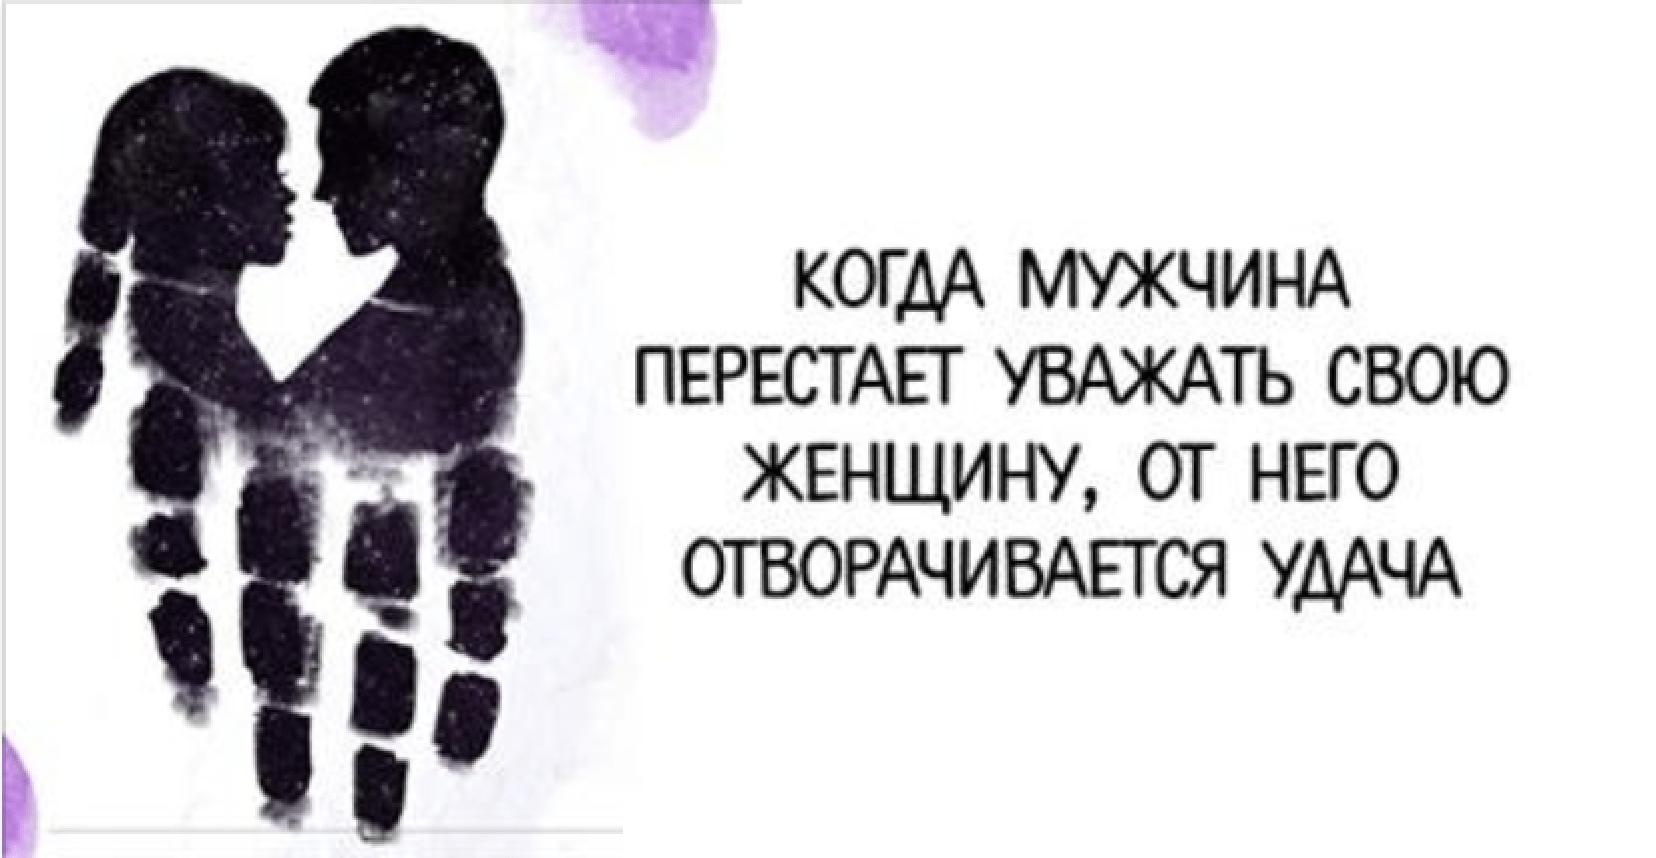 http://makataka.su/uploads/posts/2018-02/1518029420_10.png